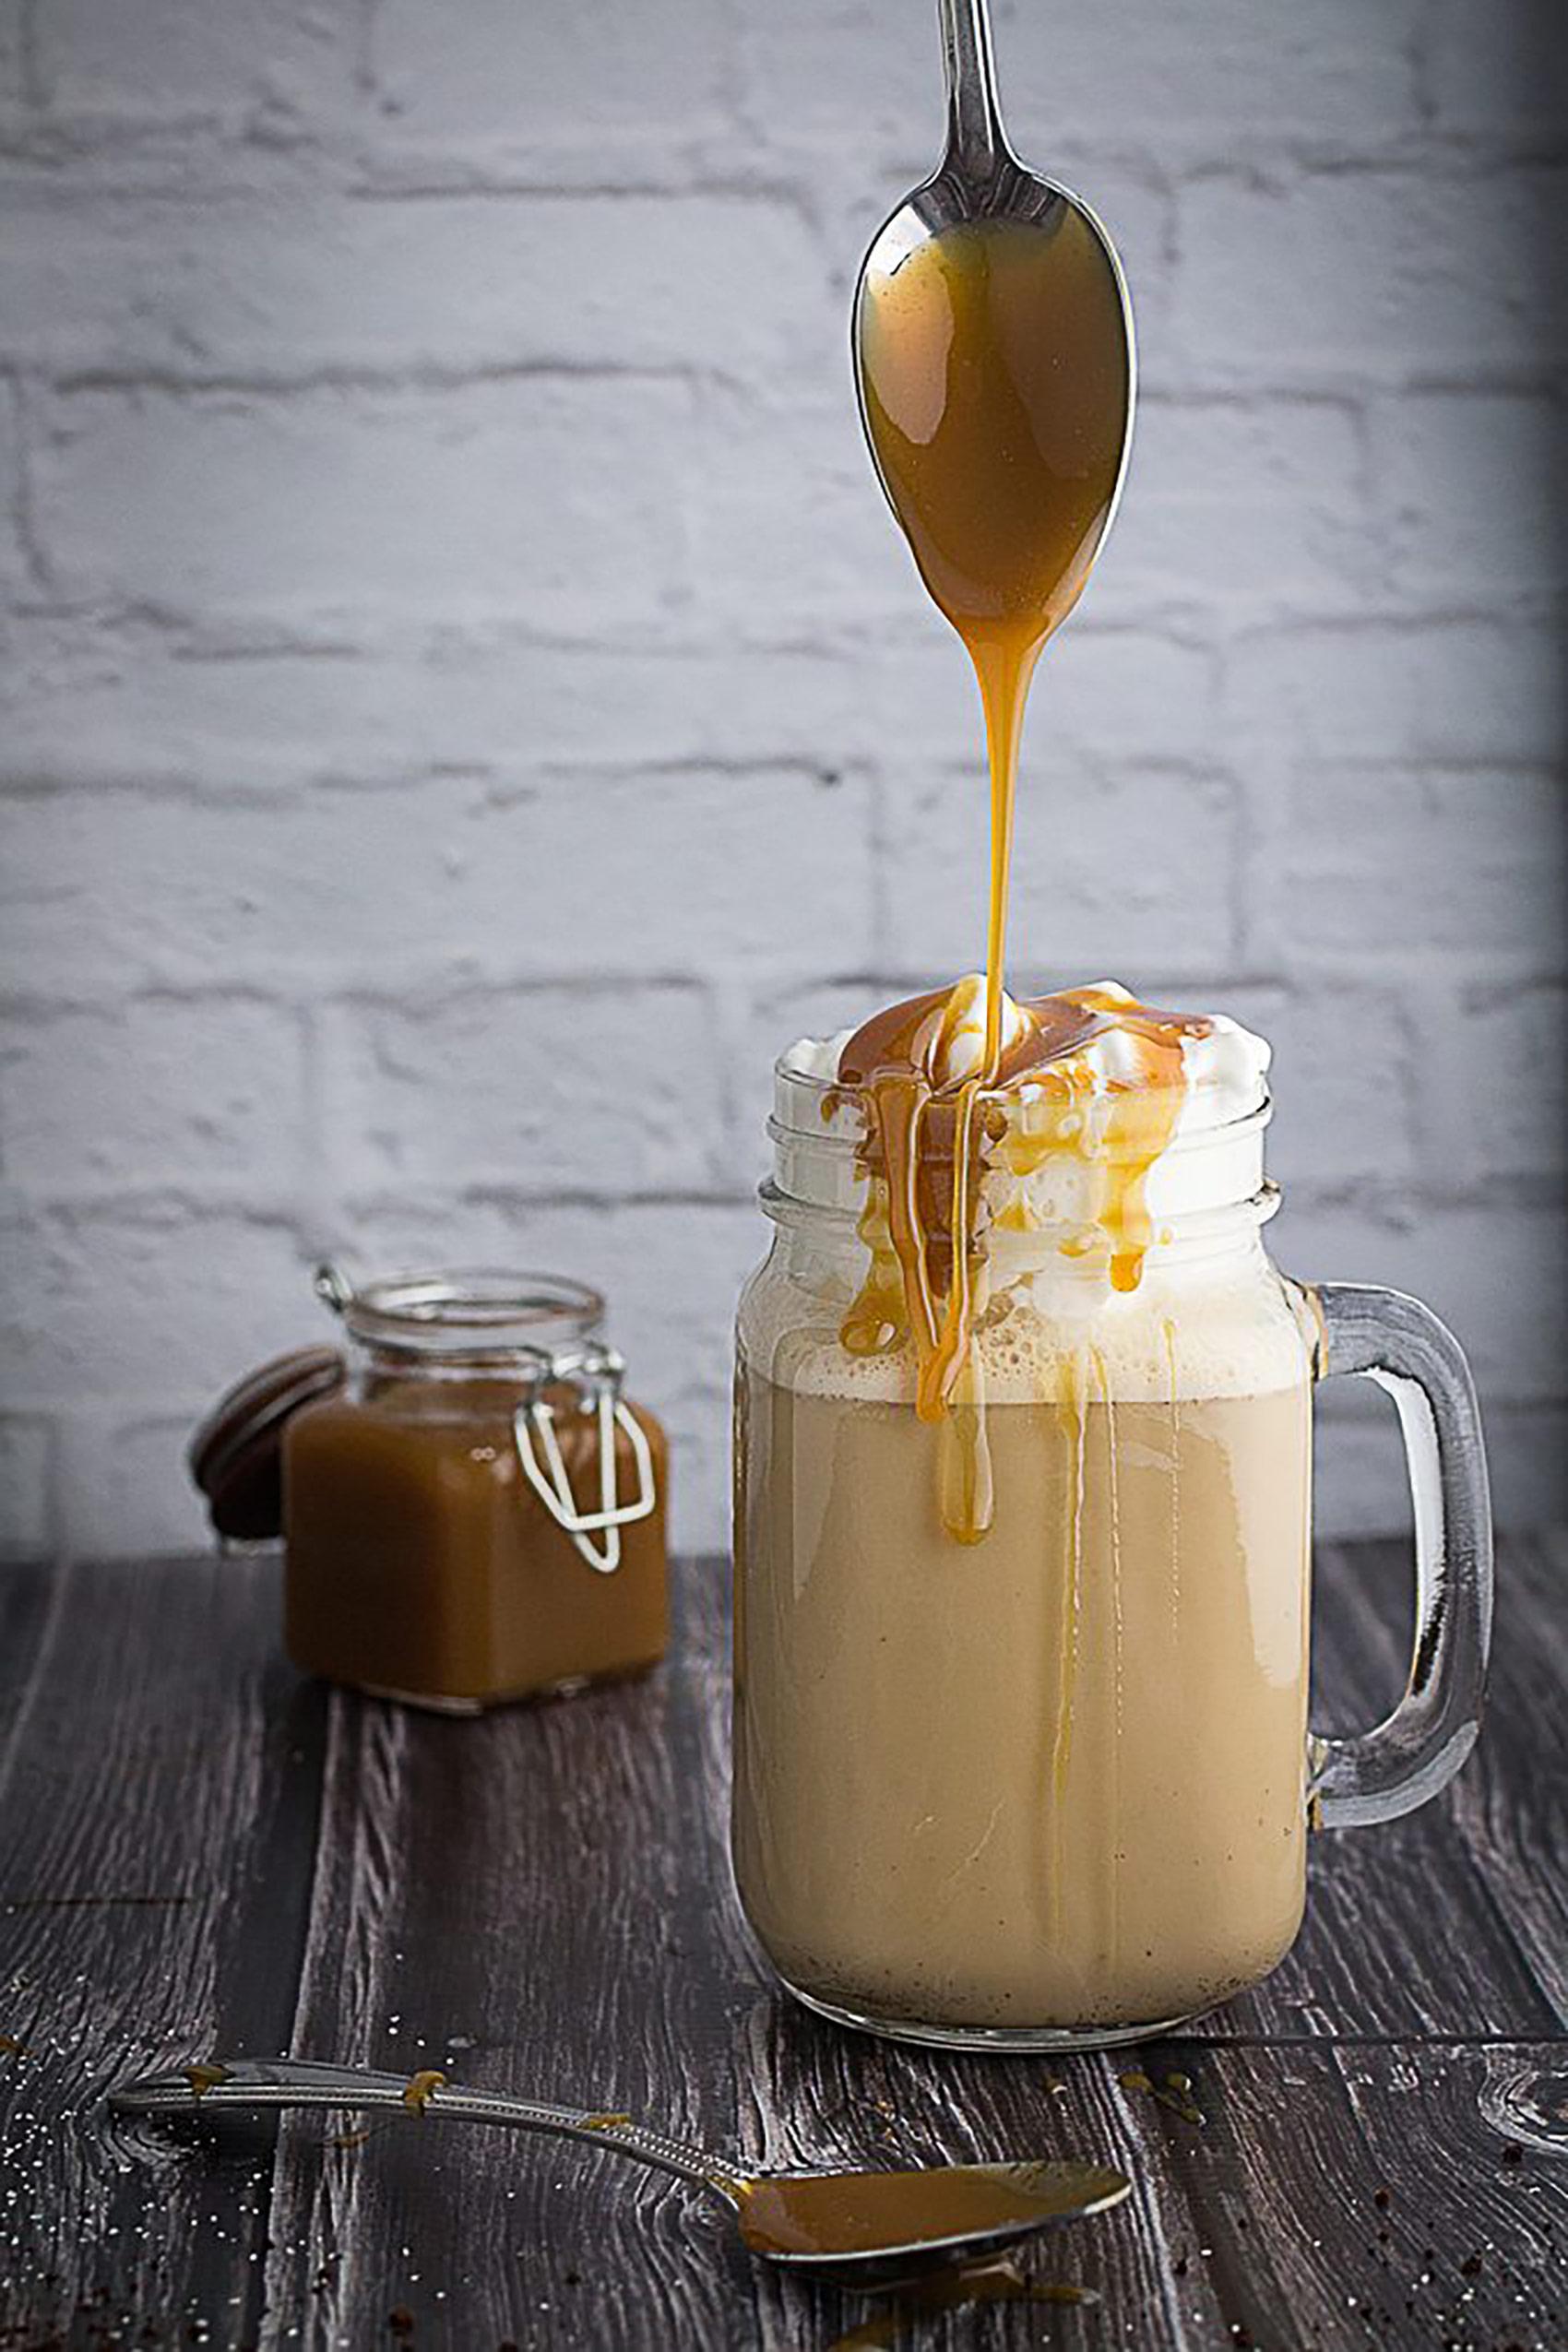 Dishing Delish Salted Caramel Frappuccino Milkshake